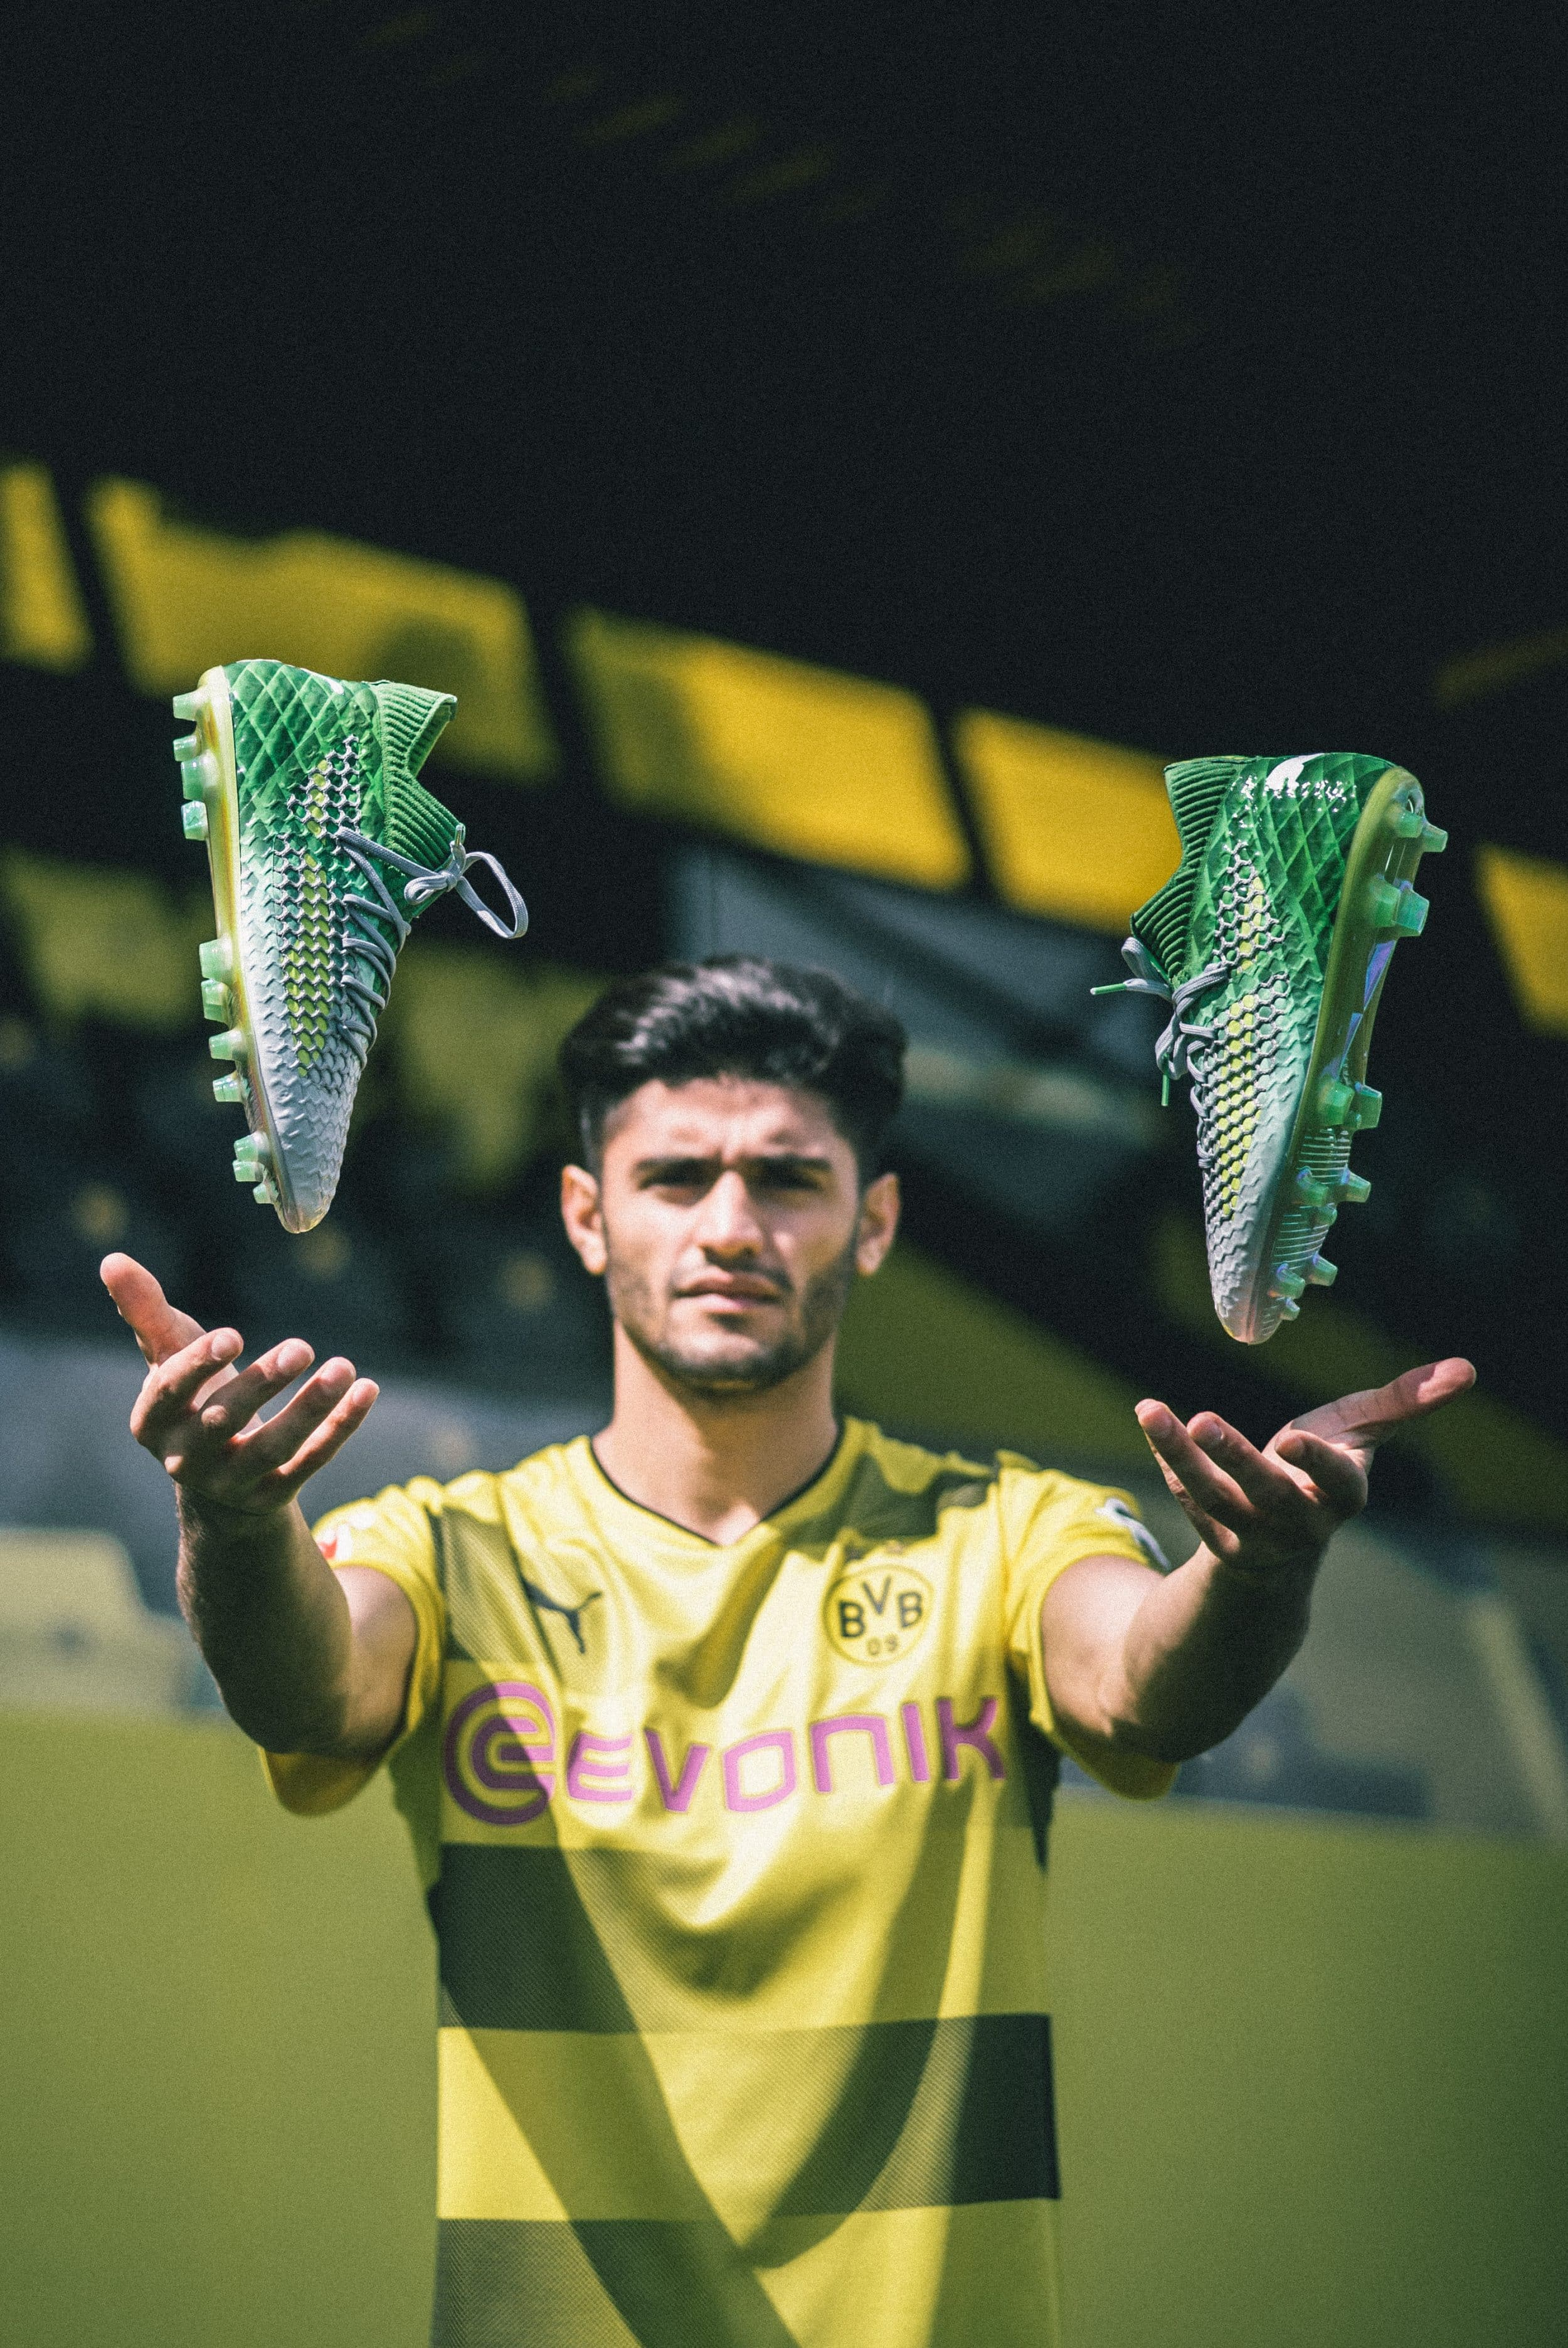 Chaussures-football-puma-future-next-dahoud-mai-2018